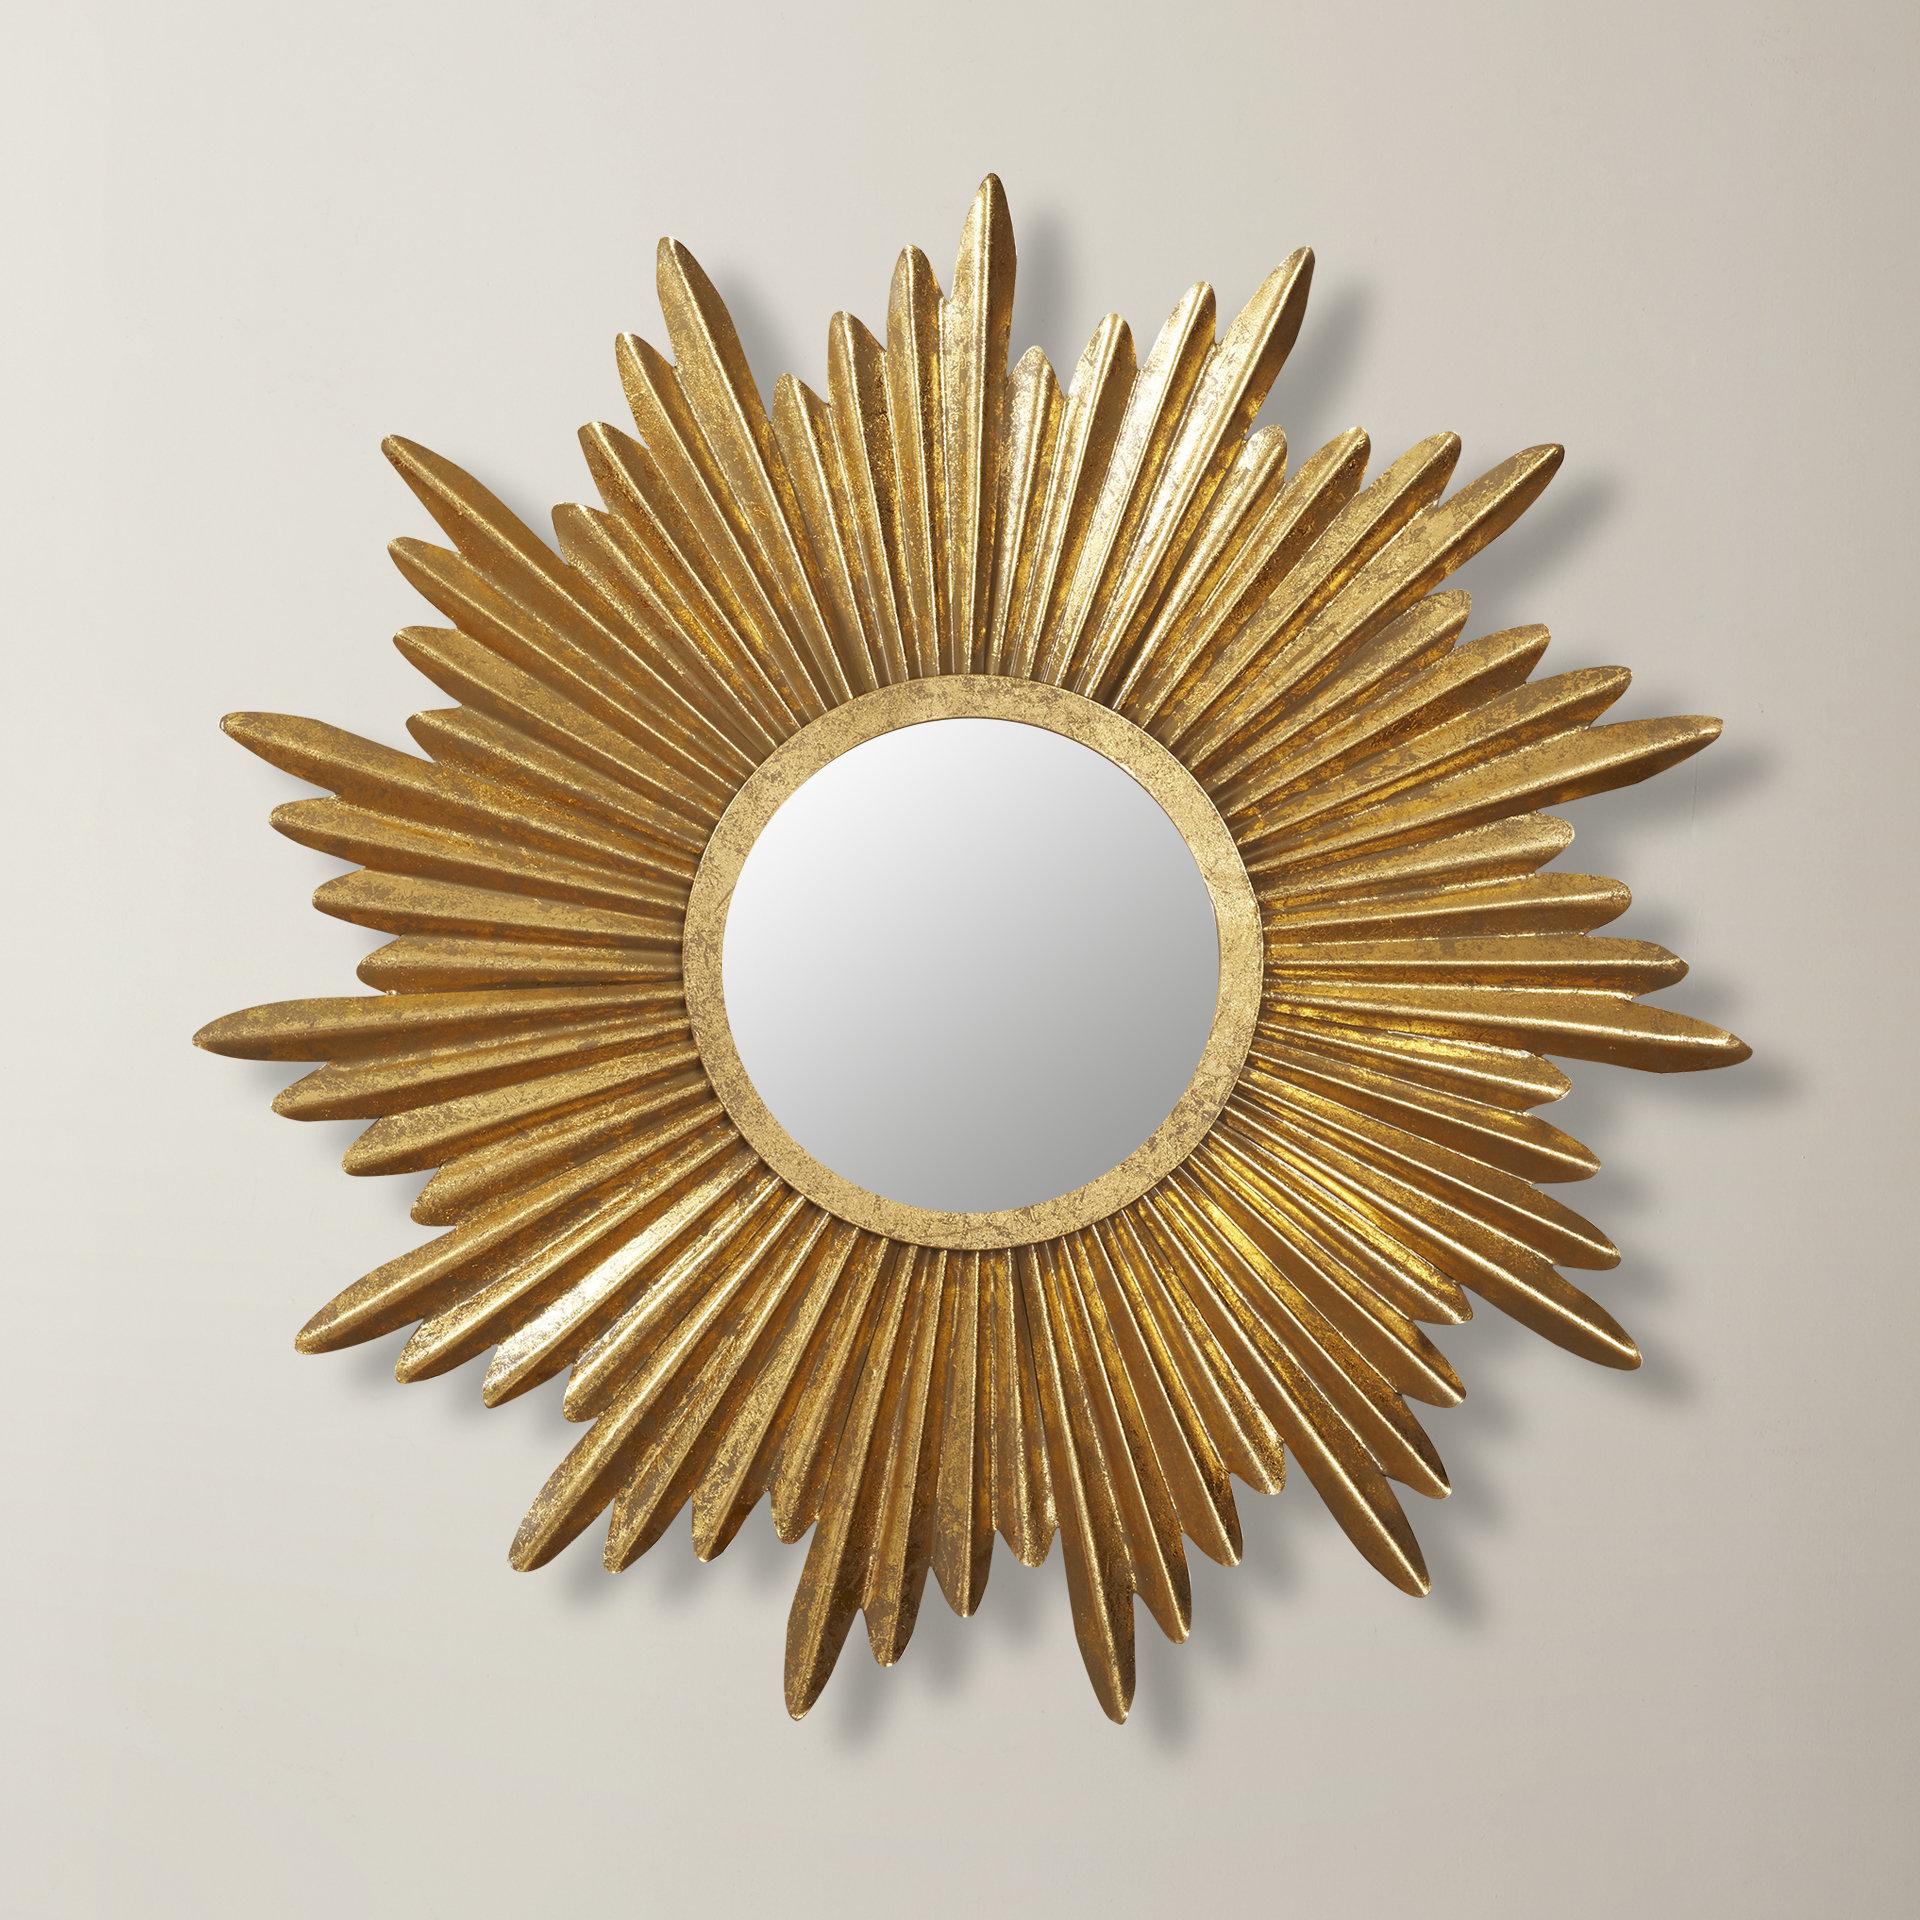 Birksgate Sunburst Accent Mirrors Regarding Well Known Traditional Sunburst Wall Mirror (View 13 of 20)